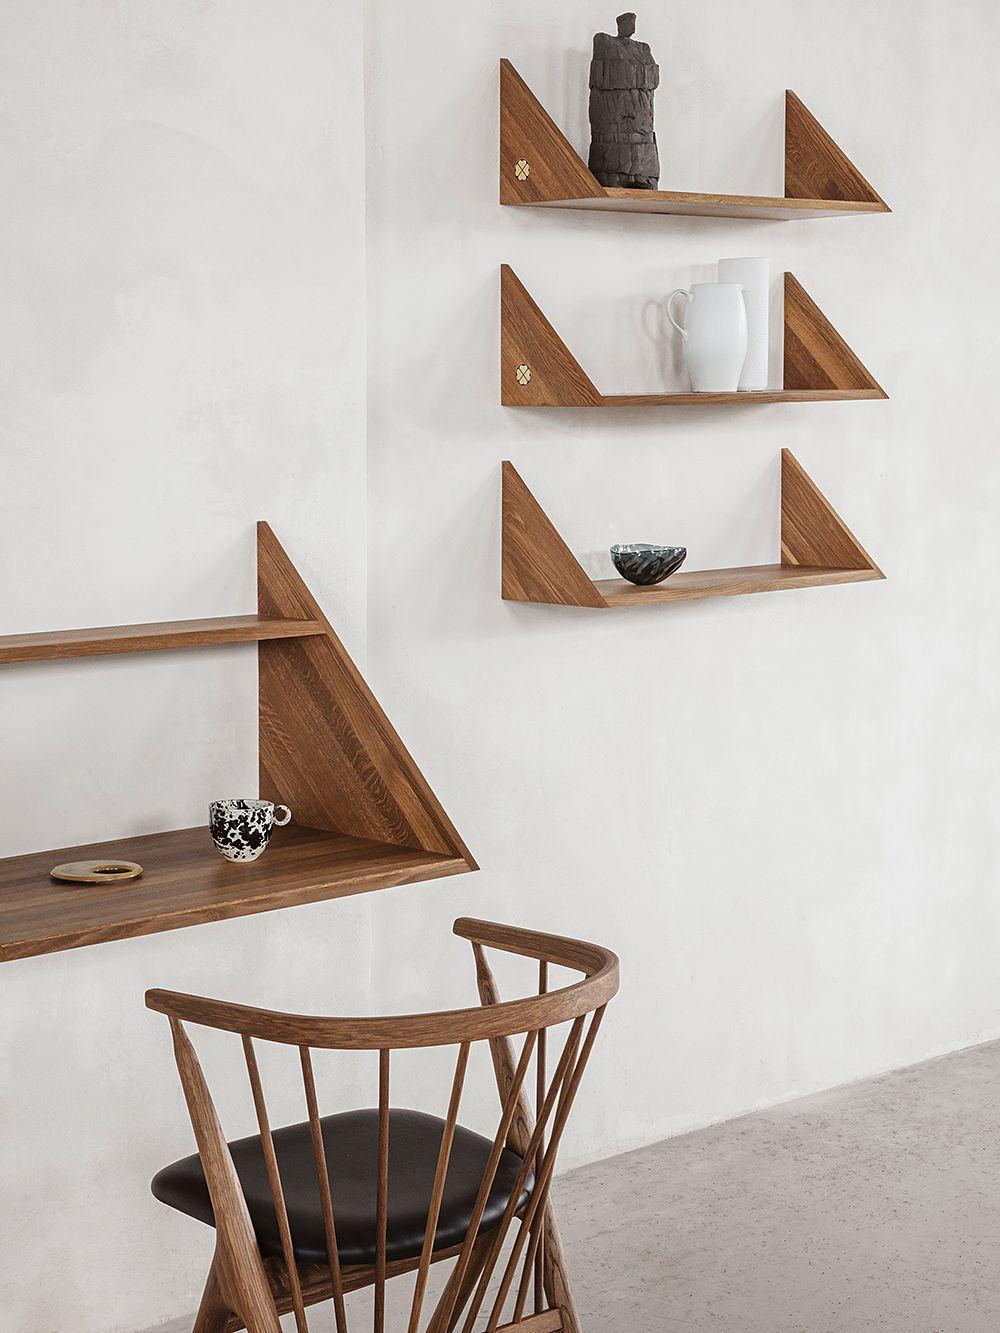 Sibast Furniture Xibris shelves and desk